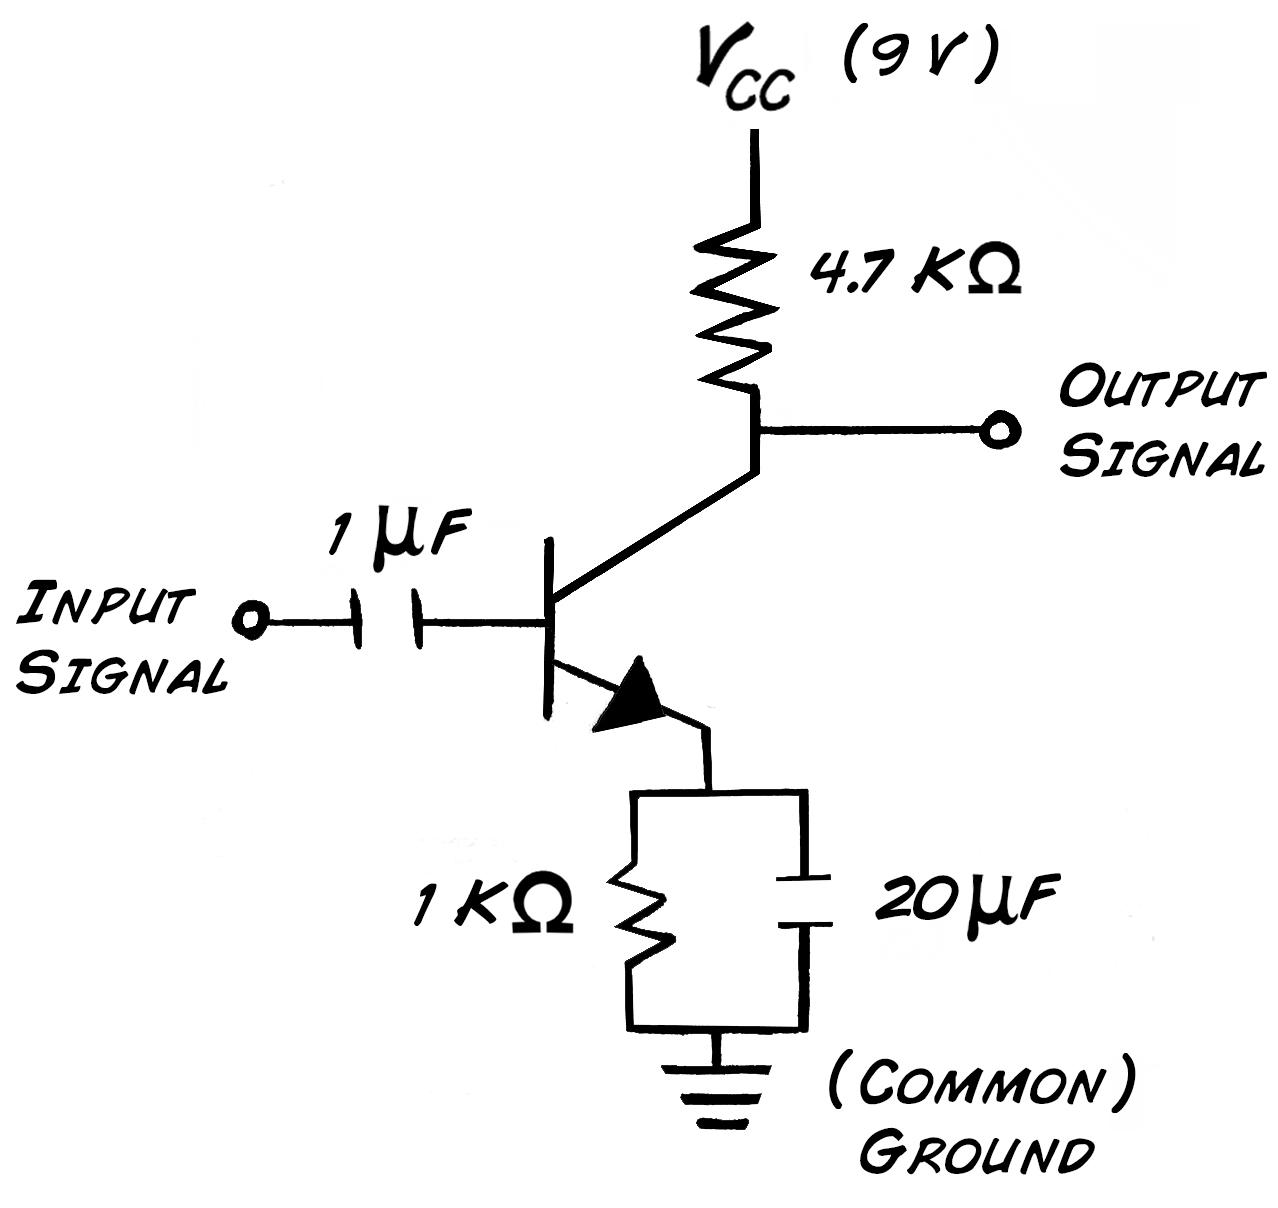 Marvelous Experiment Transistor Circuit Design Wiring Cloud Ittabpendurdonanfuldomelitekicepsianuembamohammedshrineorg